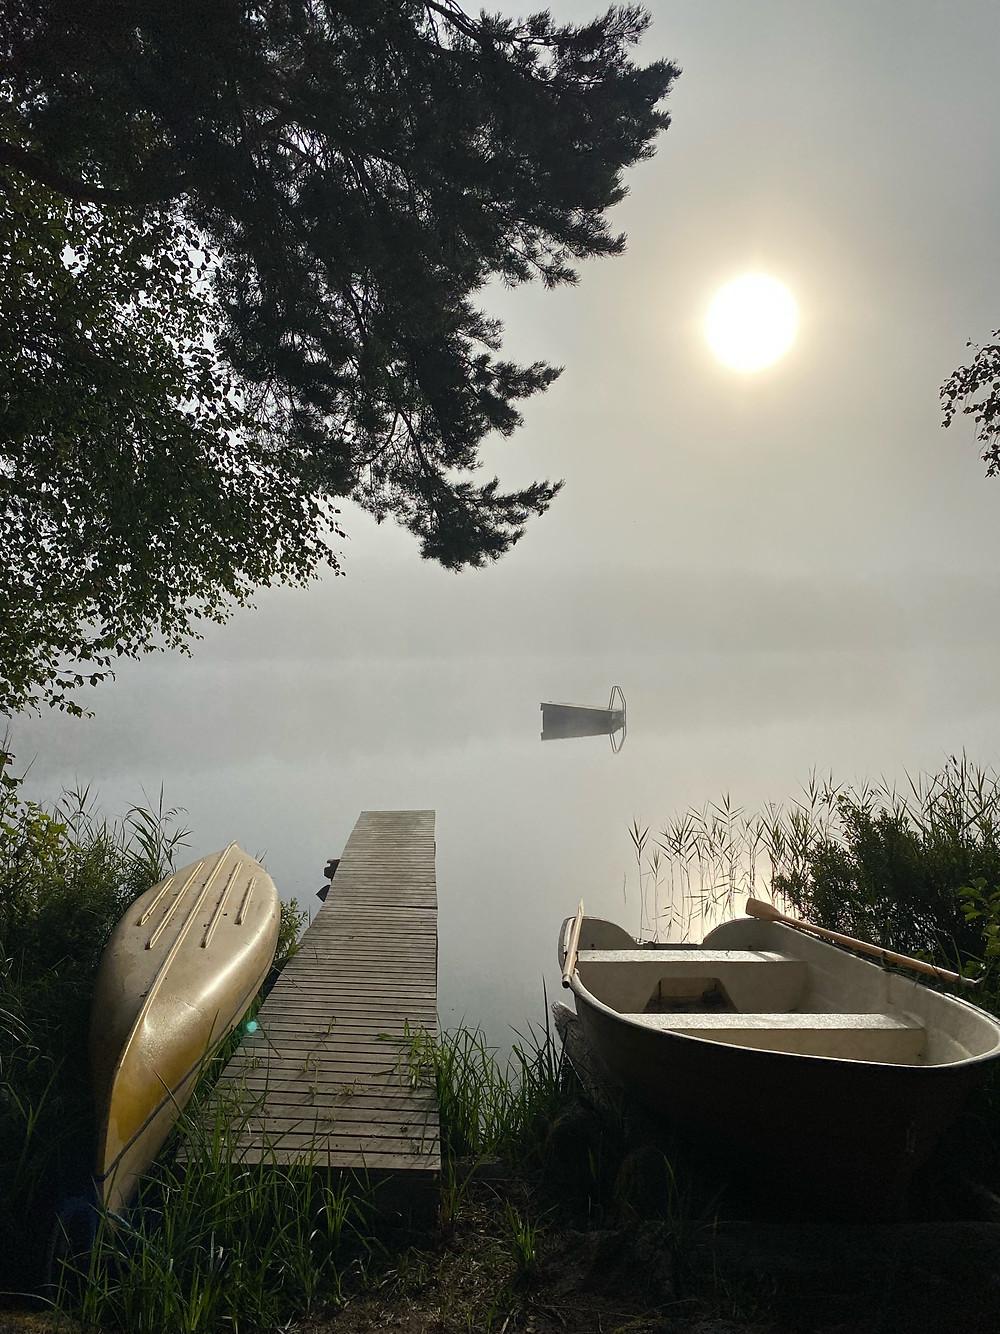 Sunrise on a Swedish lake